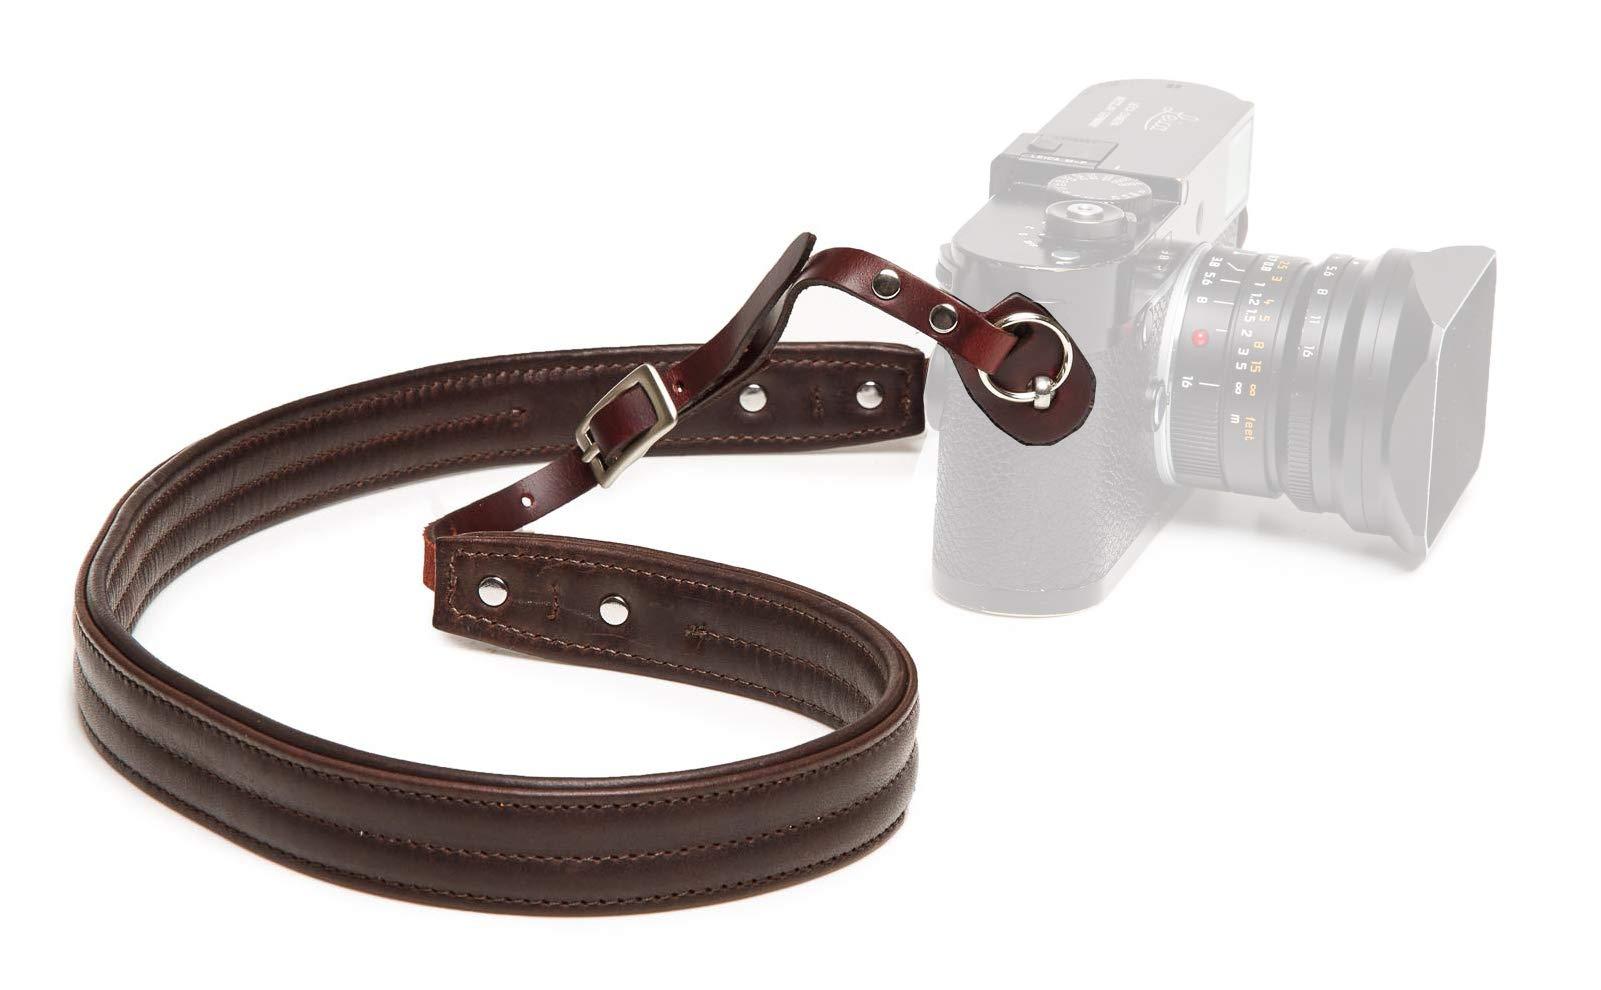 ONA - The Oslo Leather Camera Strap - Dark Truffle Leather